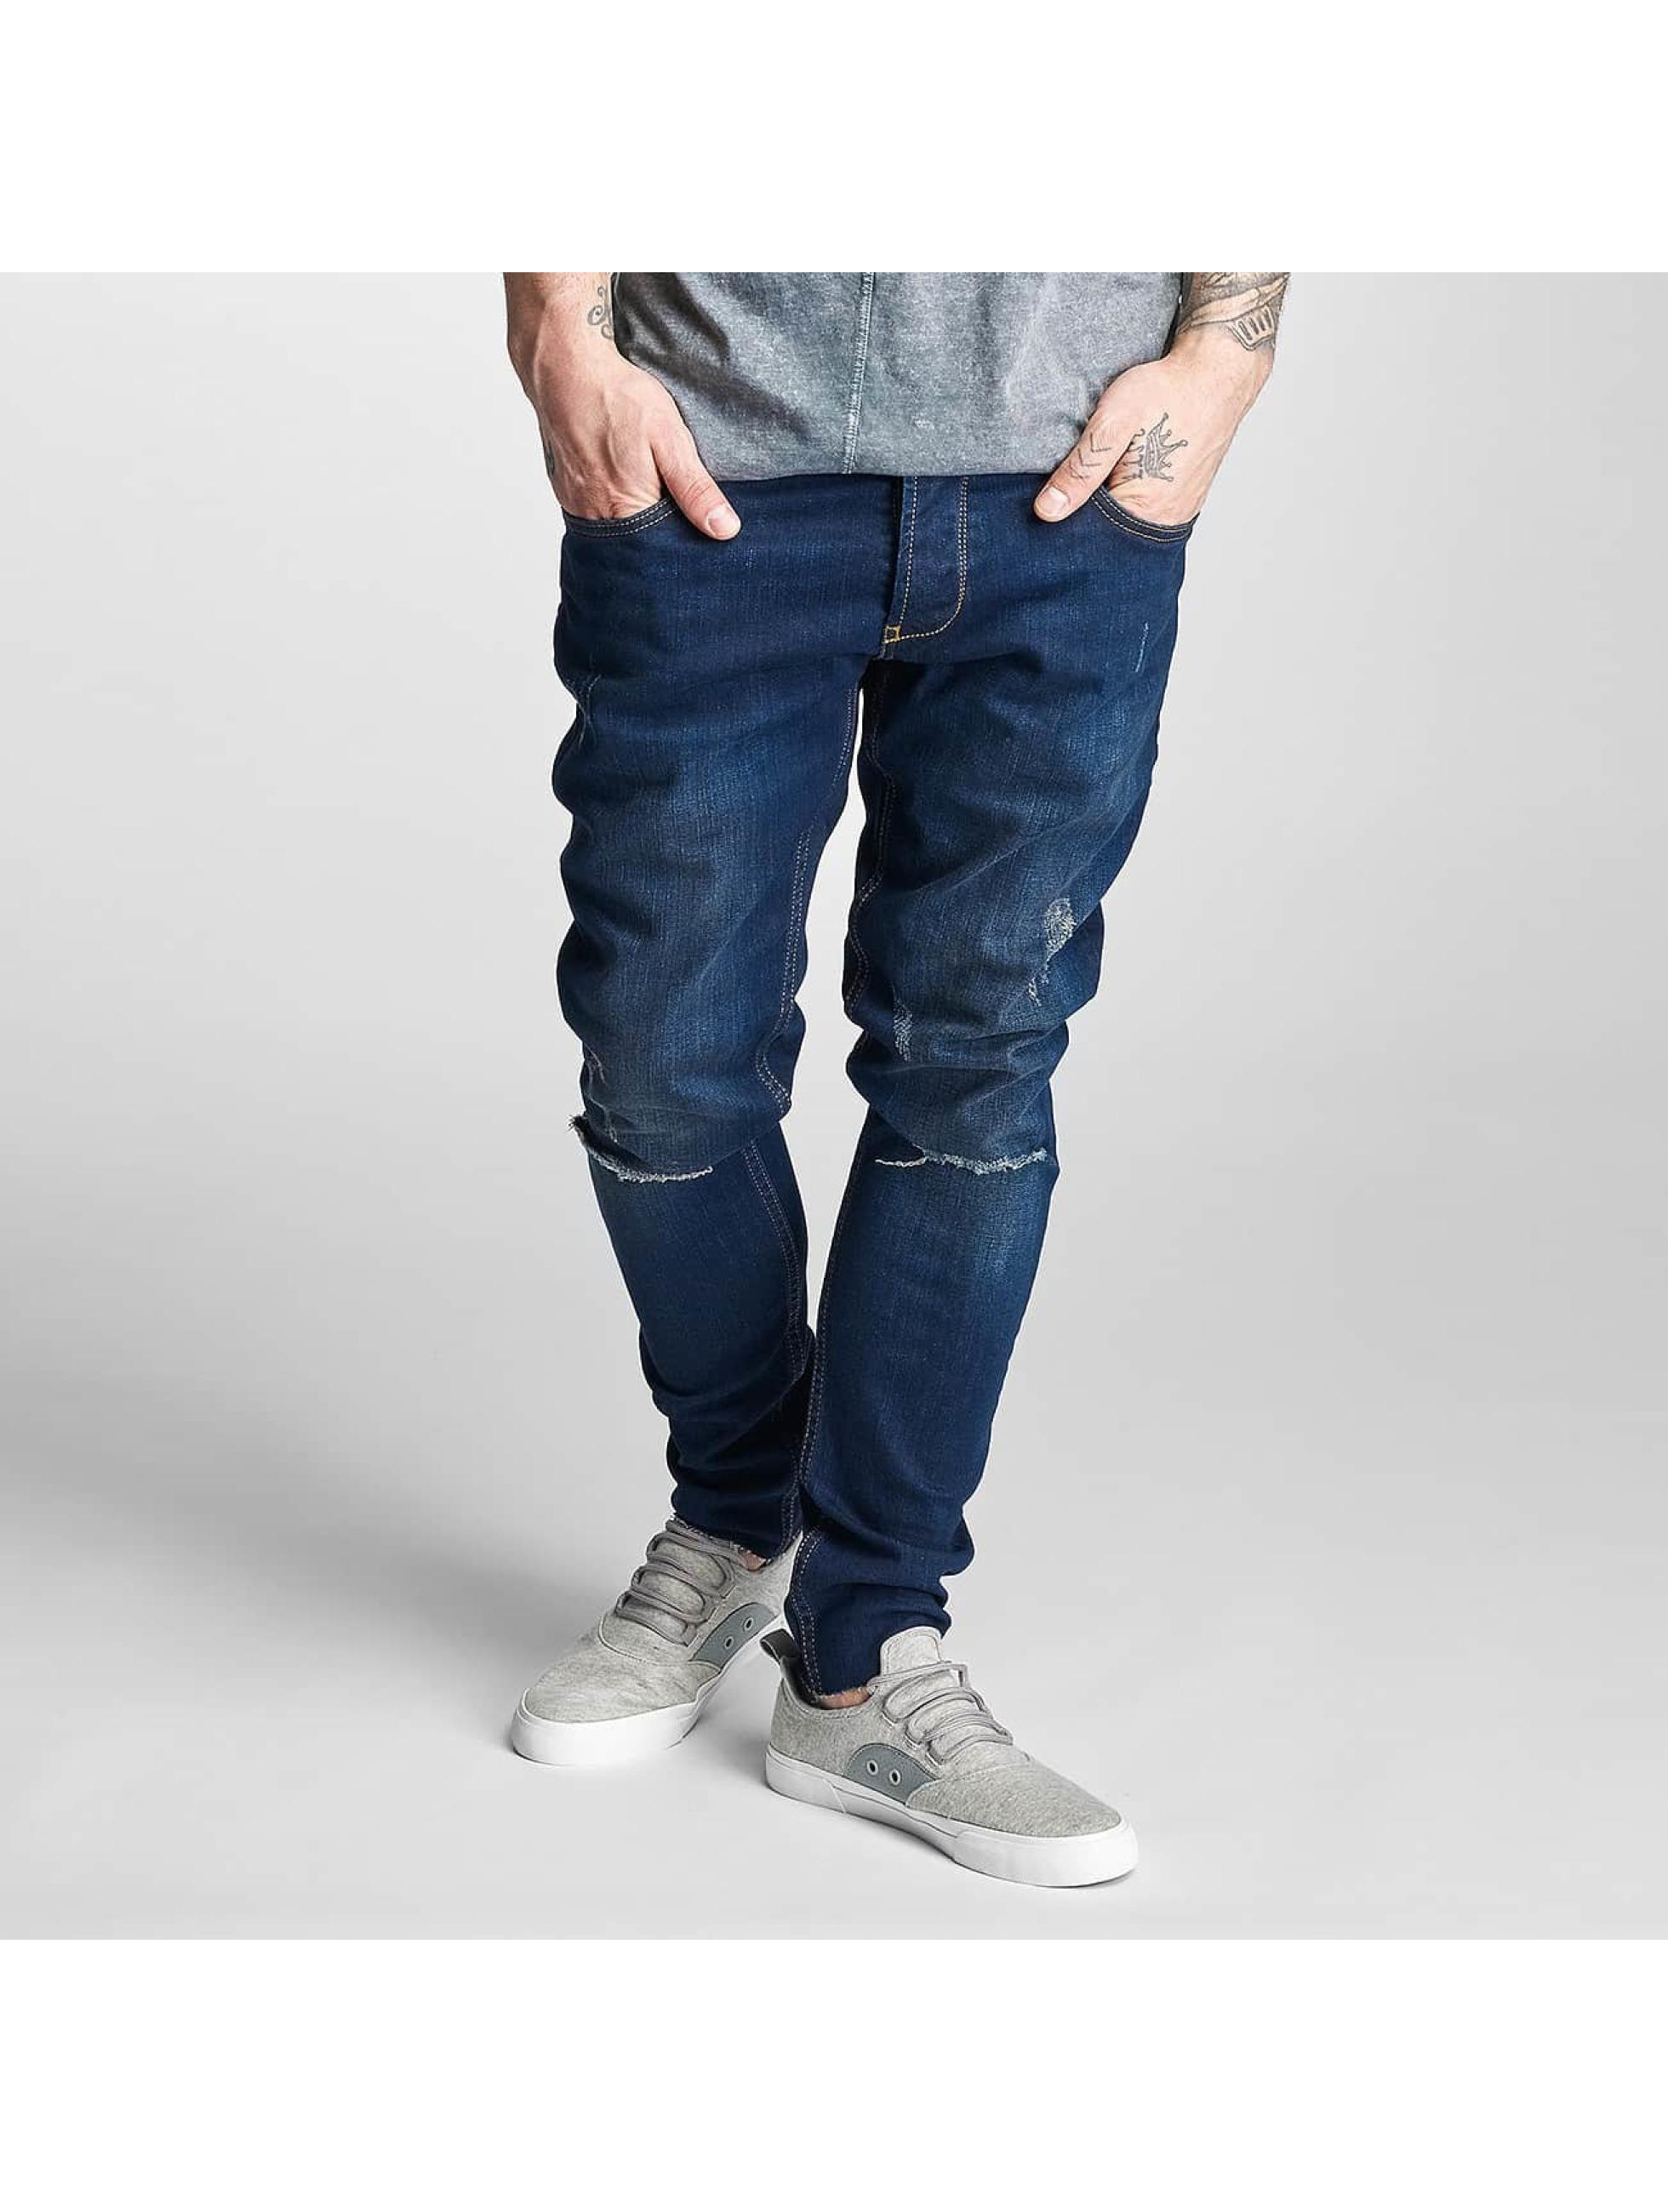 Bangastic Männer Slim Fit Jeans A75 in indigo